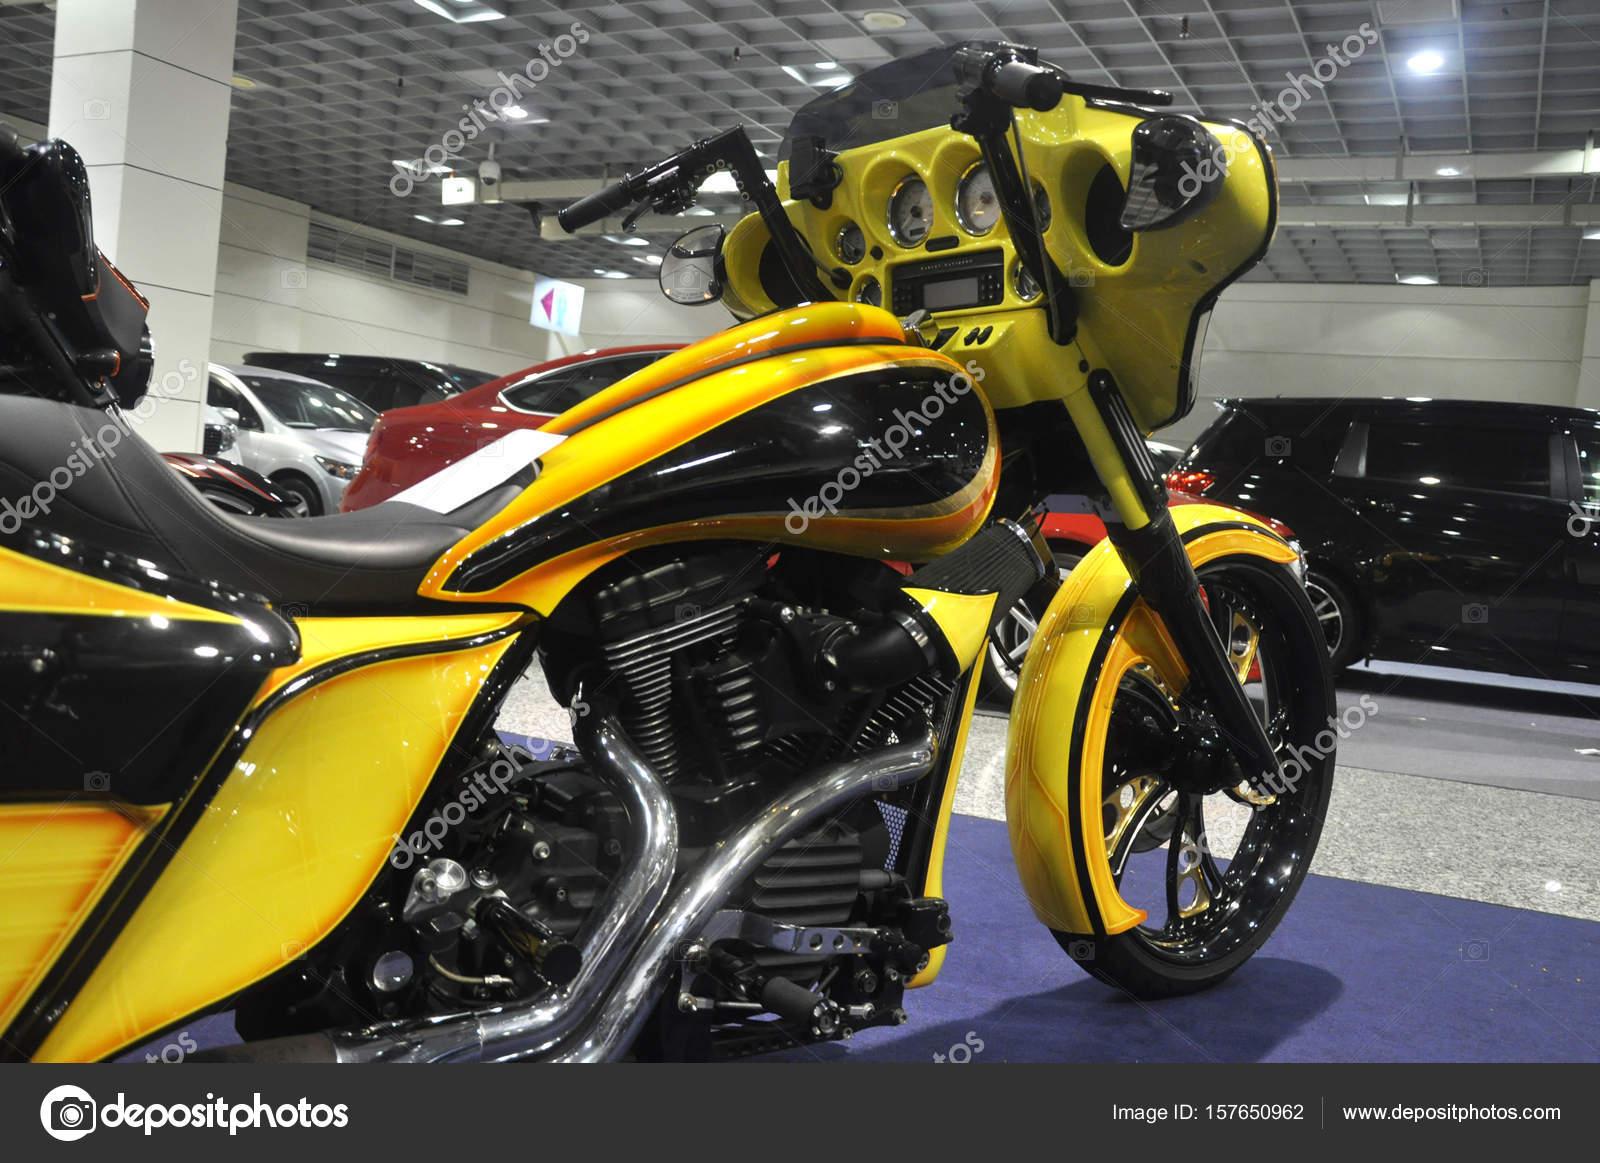 rassemblement de custom harley davidson moto photo ditoriale aisyaqilumar 157650962. Black Bedroom Furniture Sets. Home Design Ideas